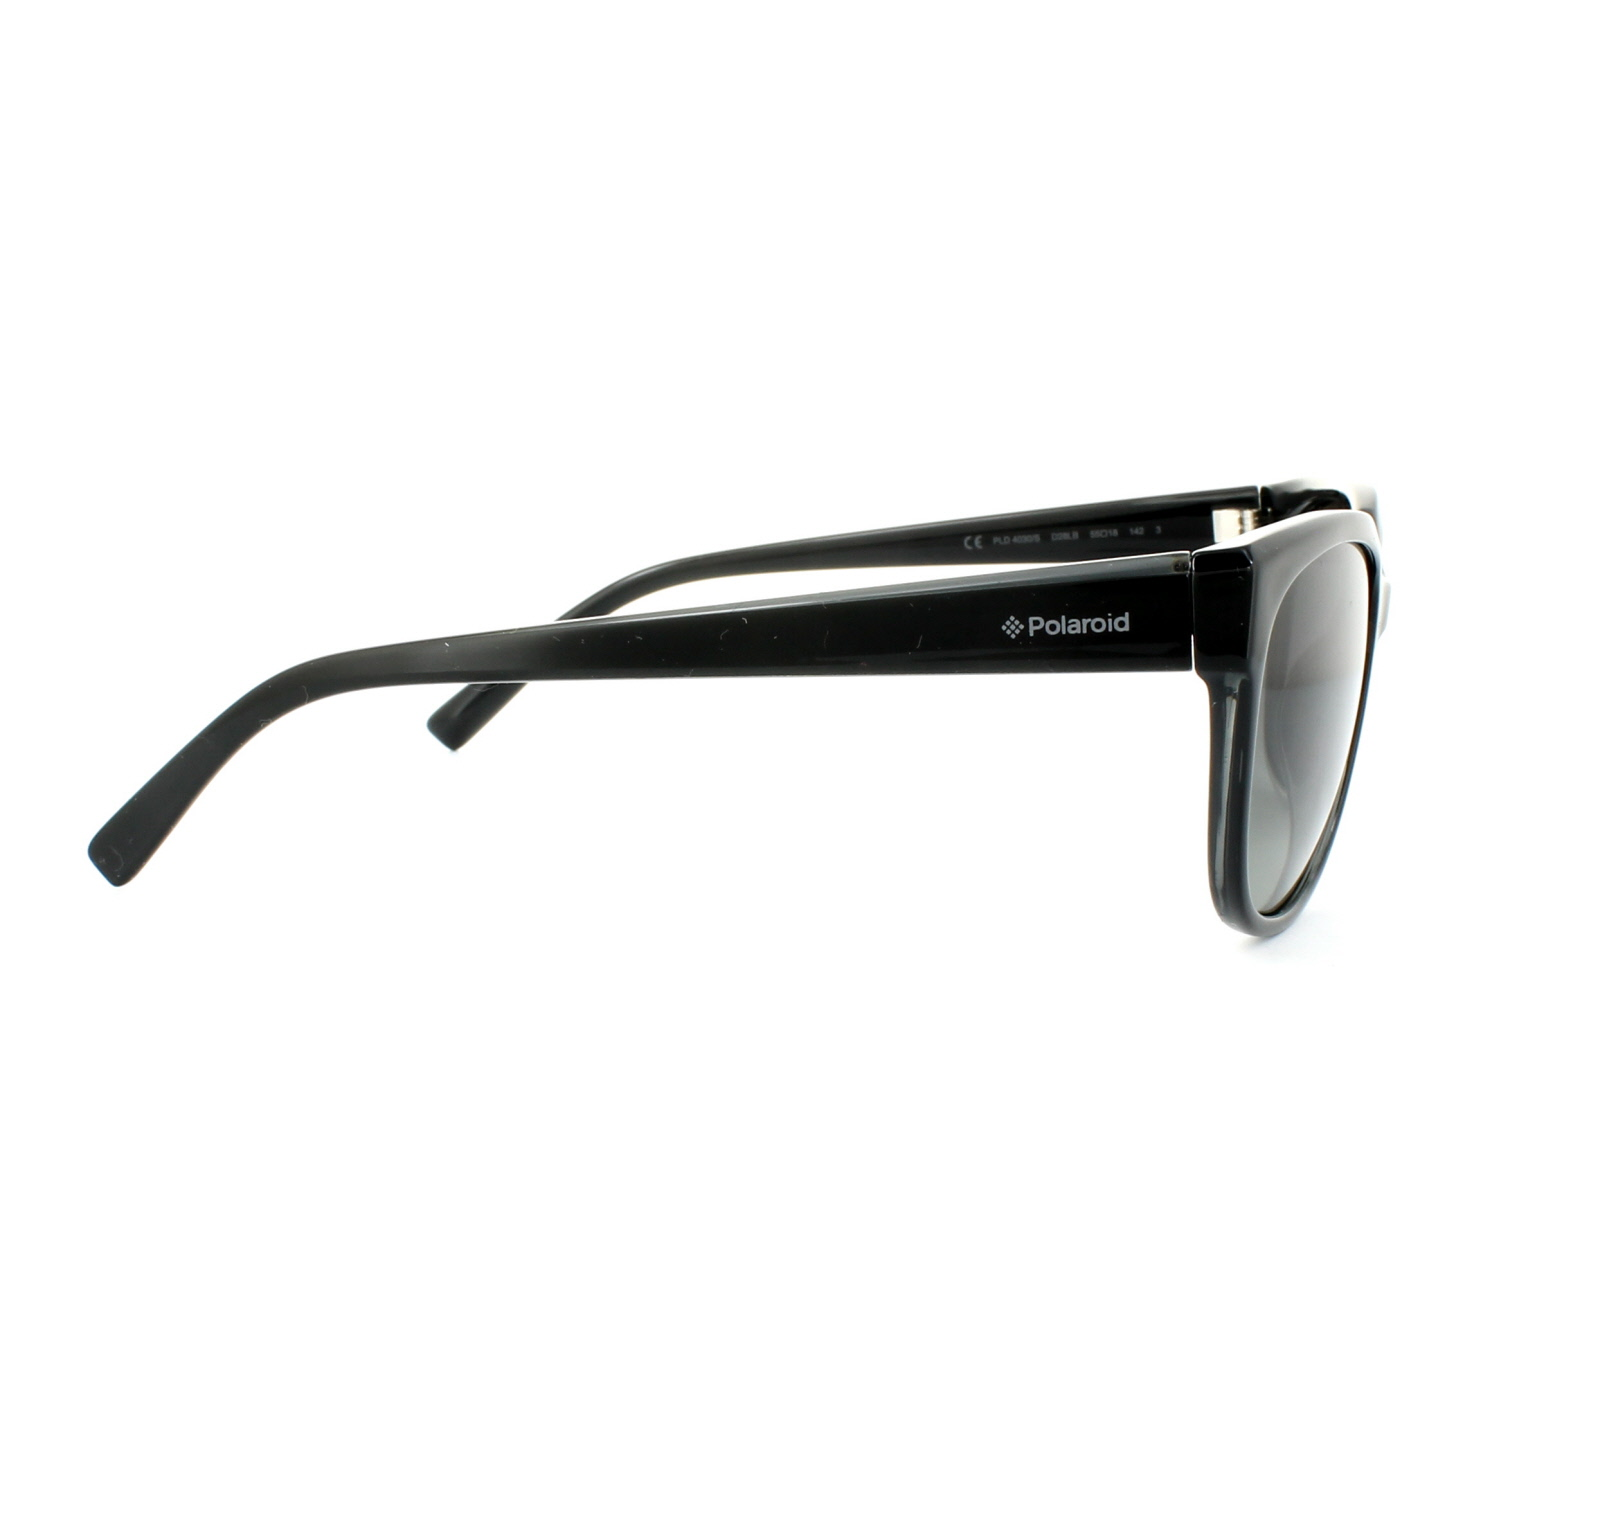 362acf98152 Cheap Polaroid PLD 4030 S Sunglasses - Discounted Sunglasses